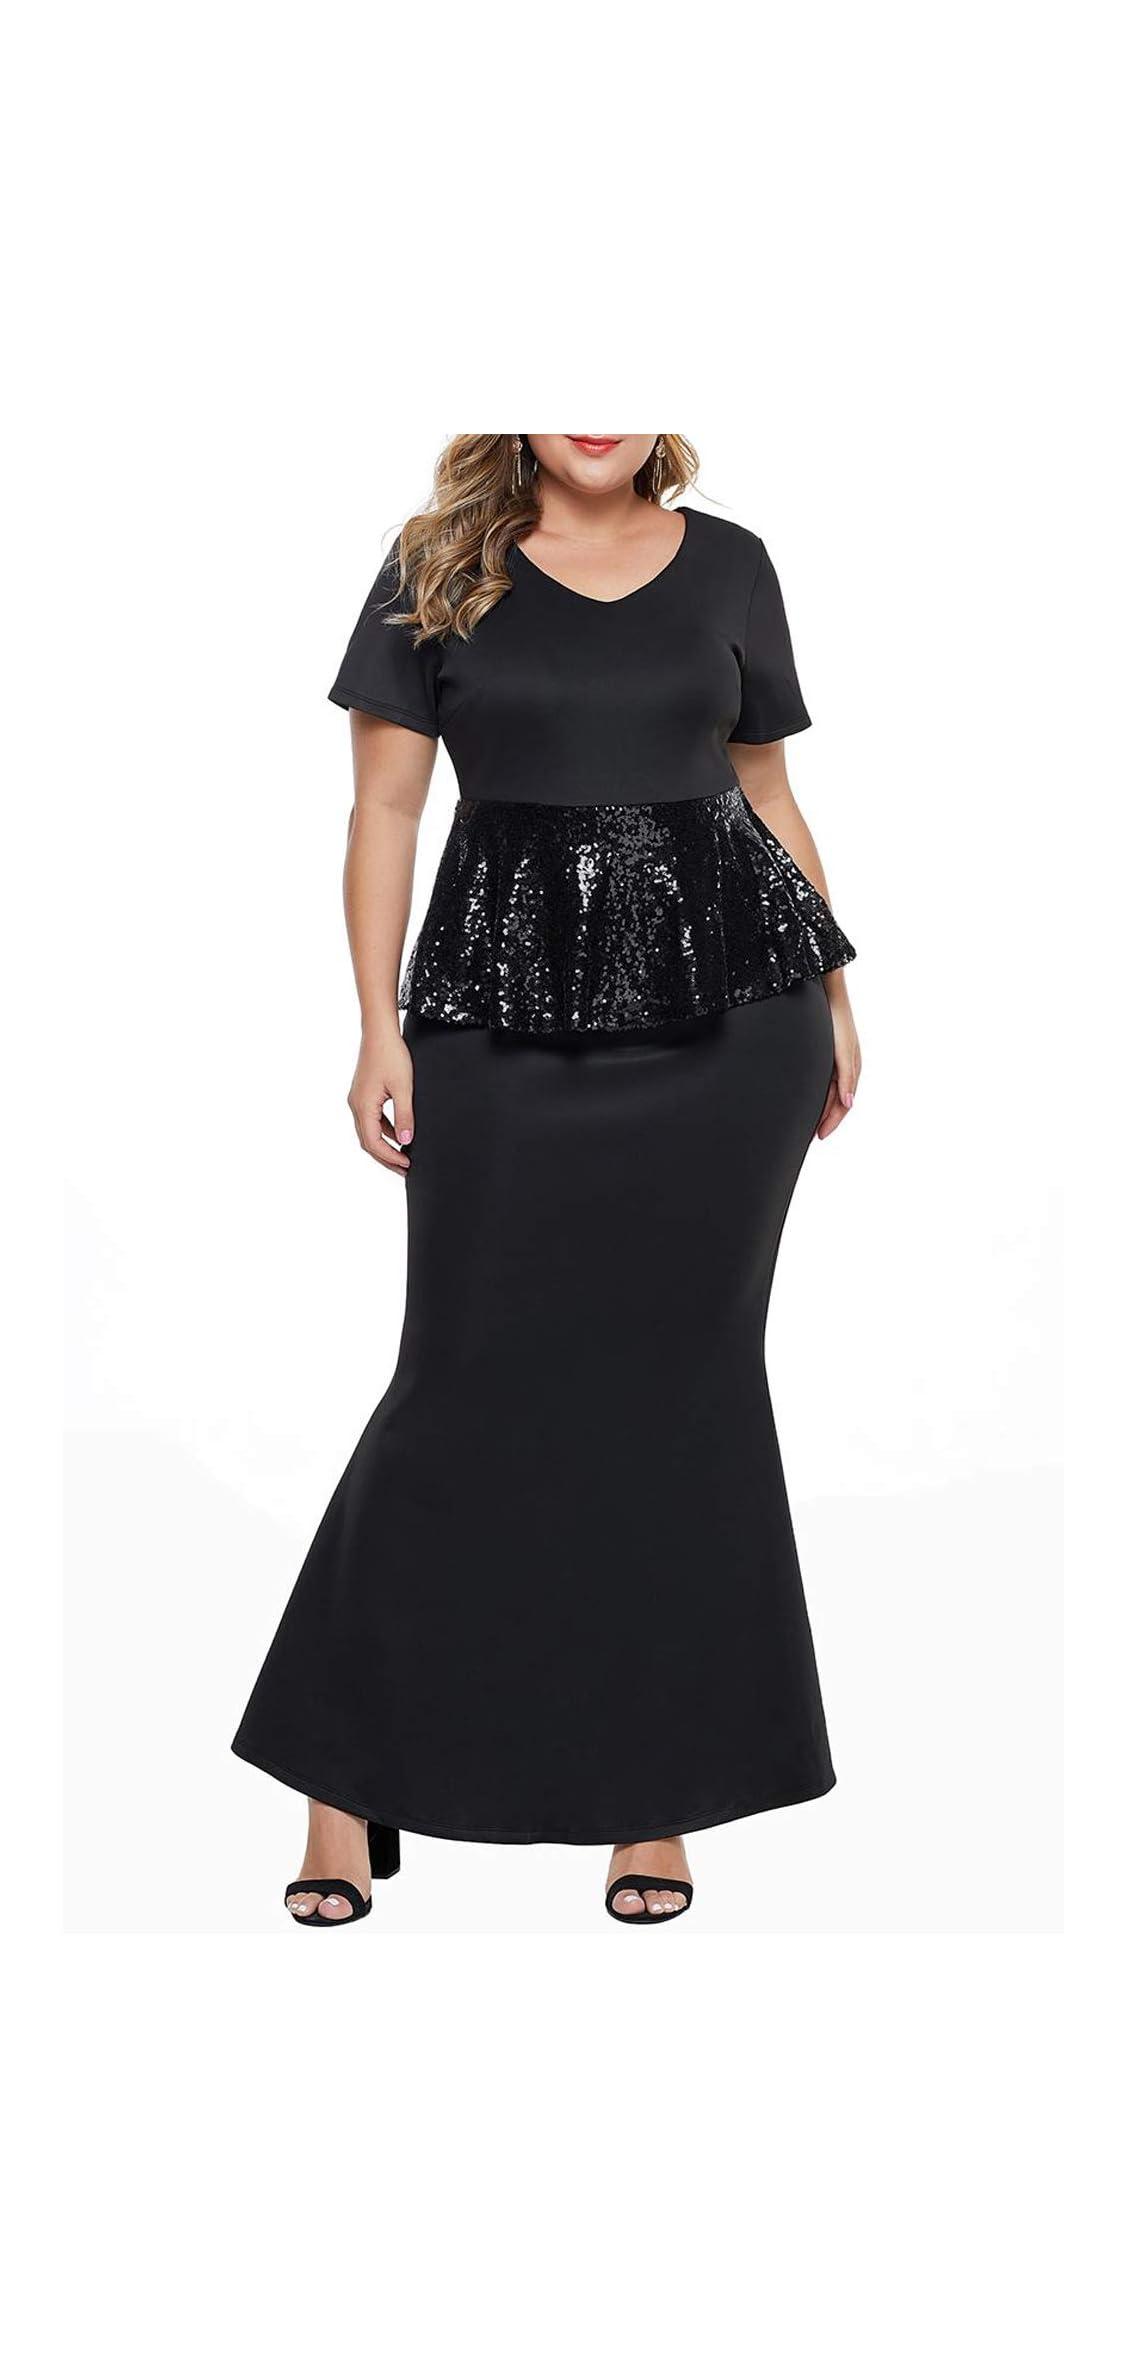 Women's Short Sleeve Rhinestone Plus Size Long Cocktail